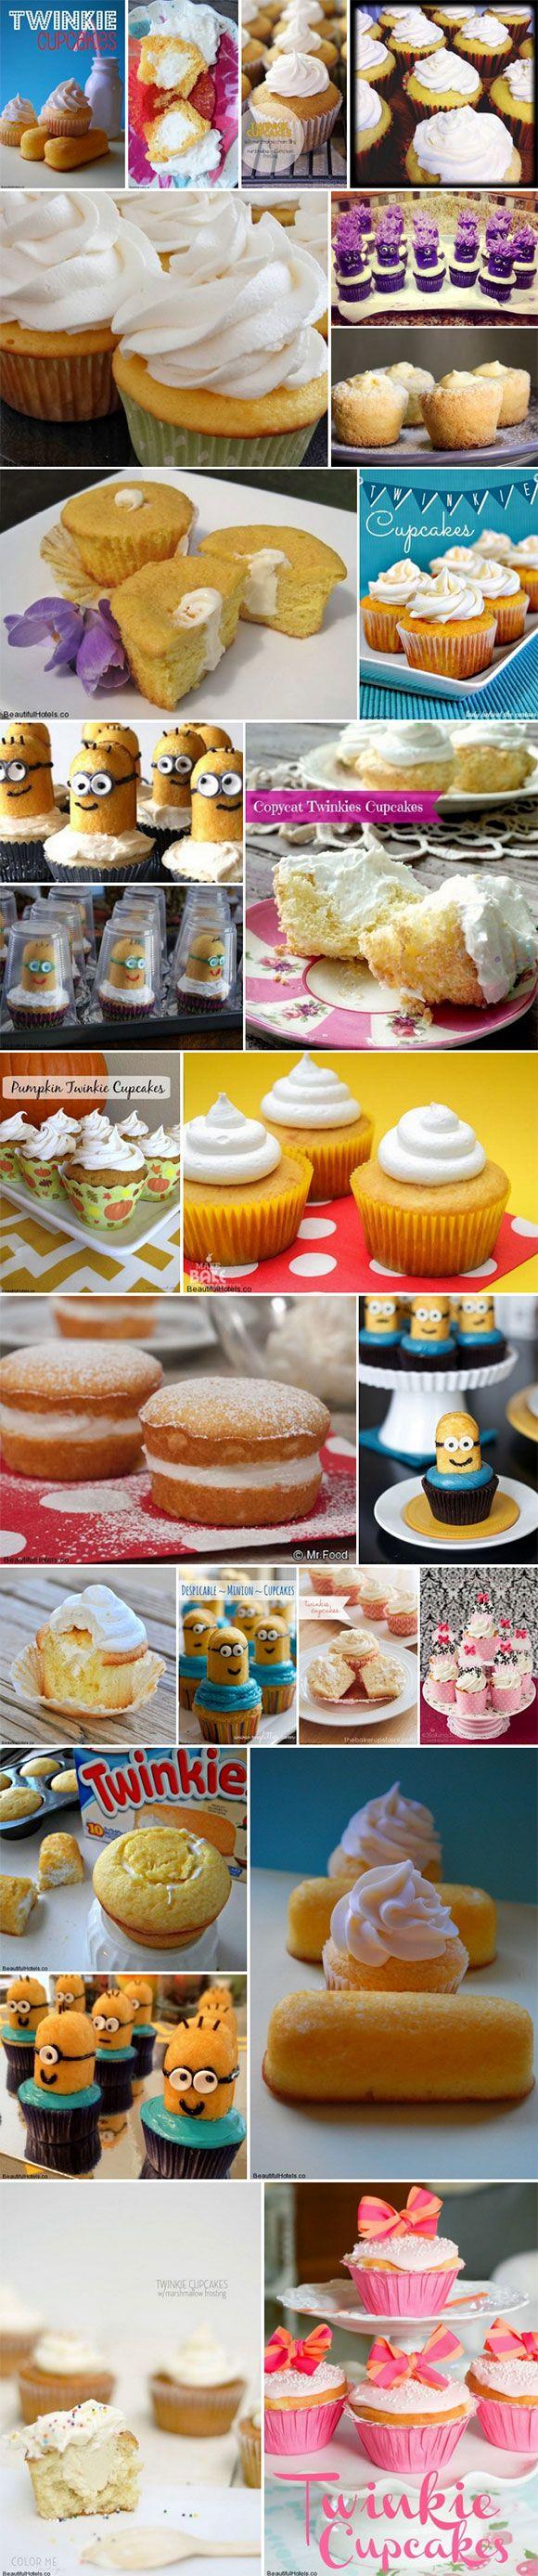 Best 25 Twinkie Cupcake Recipes found on Pinterest